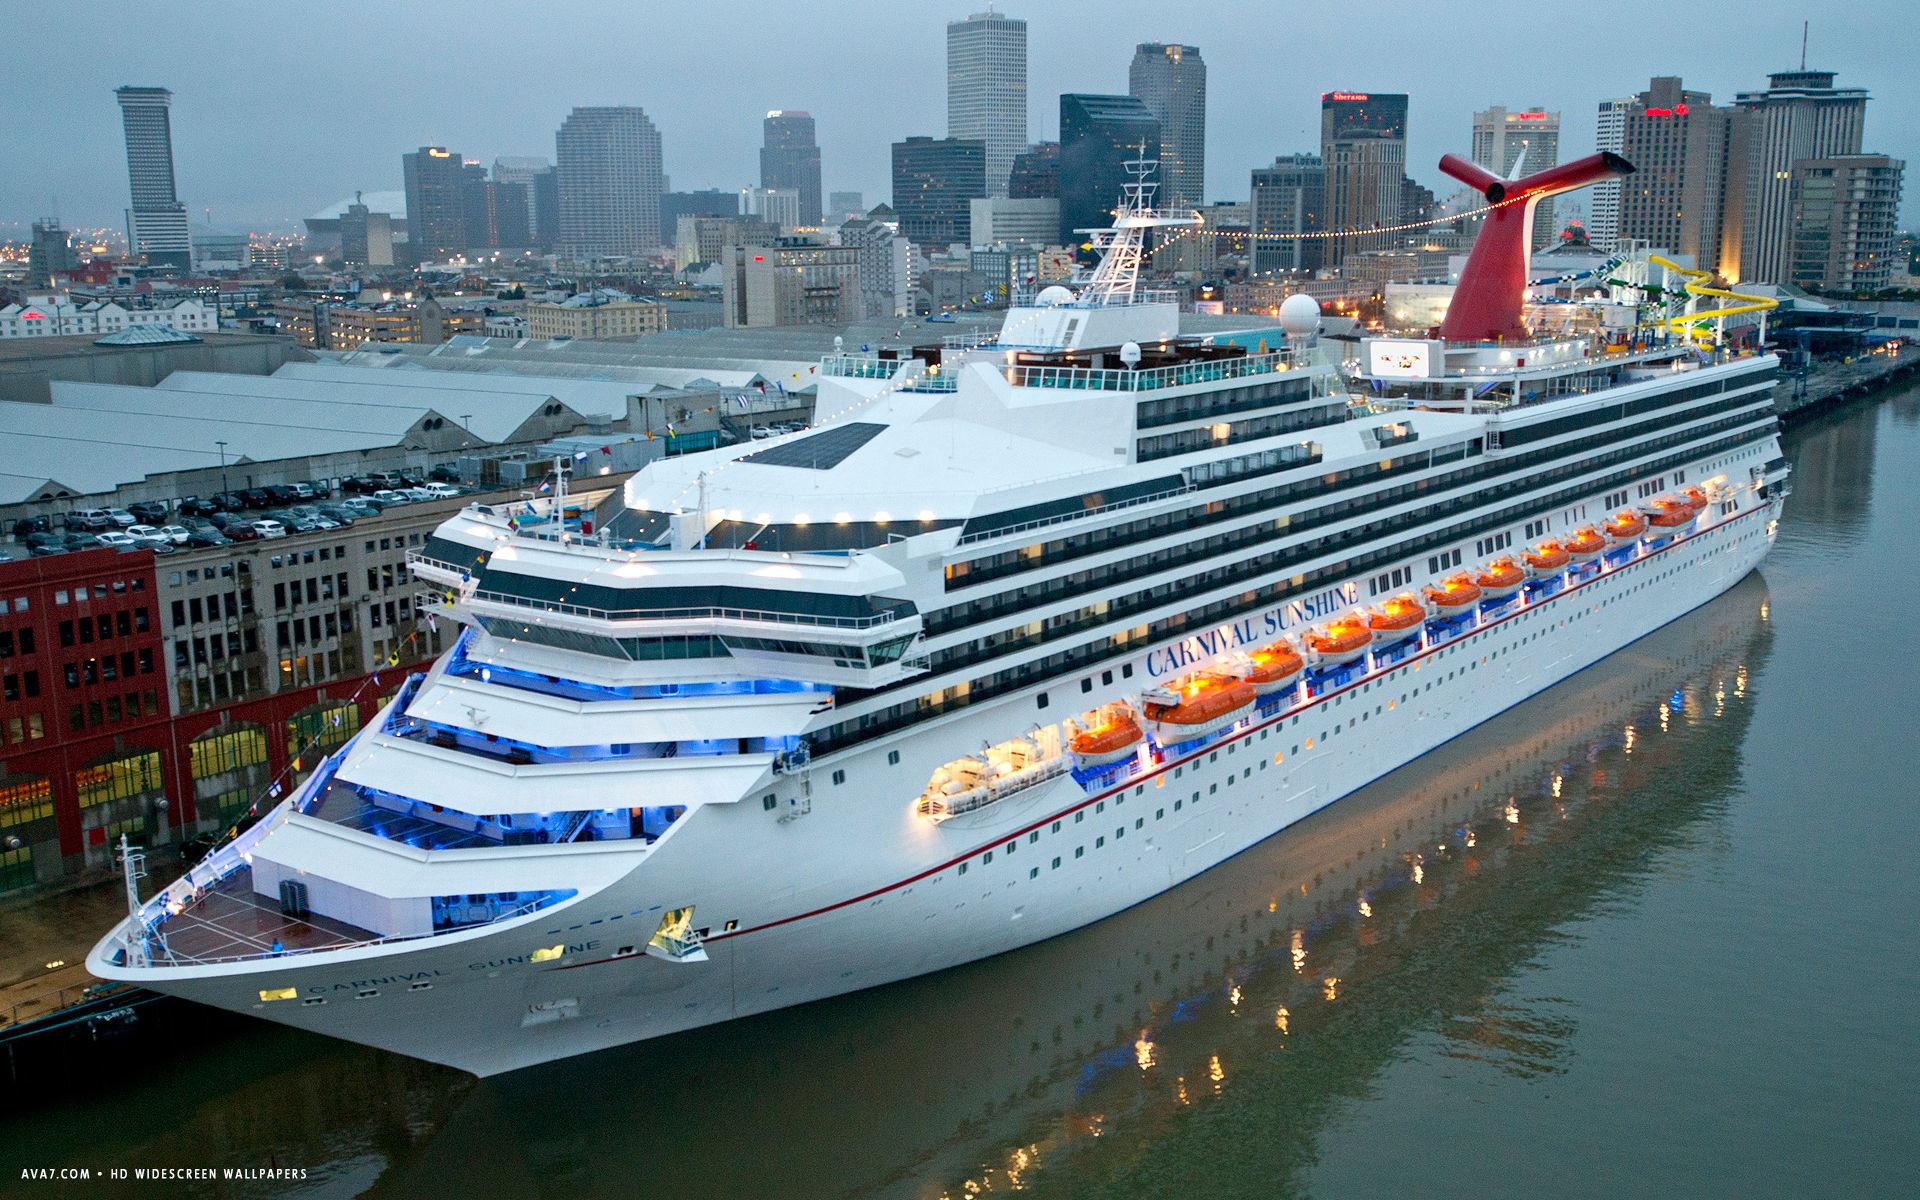 carnival sunshine cruise ship hd widescreen wallpaper